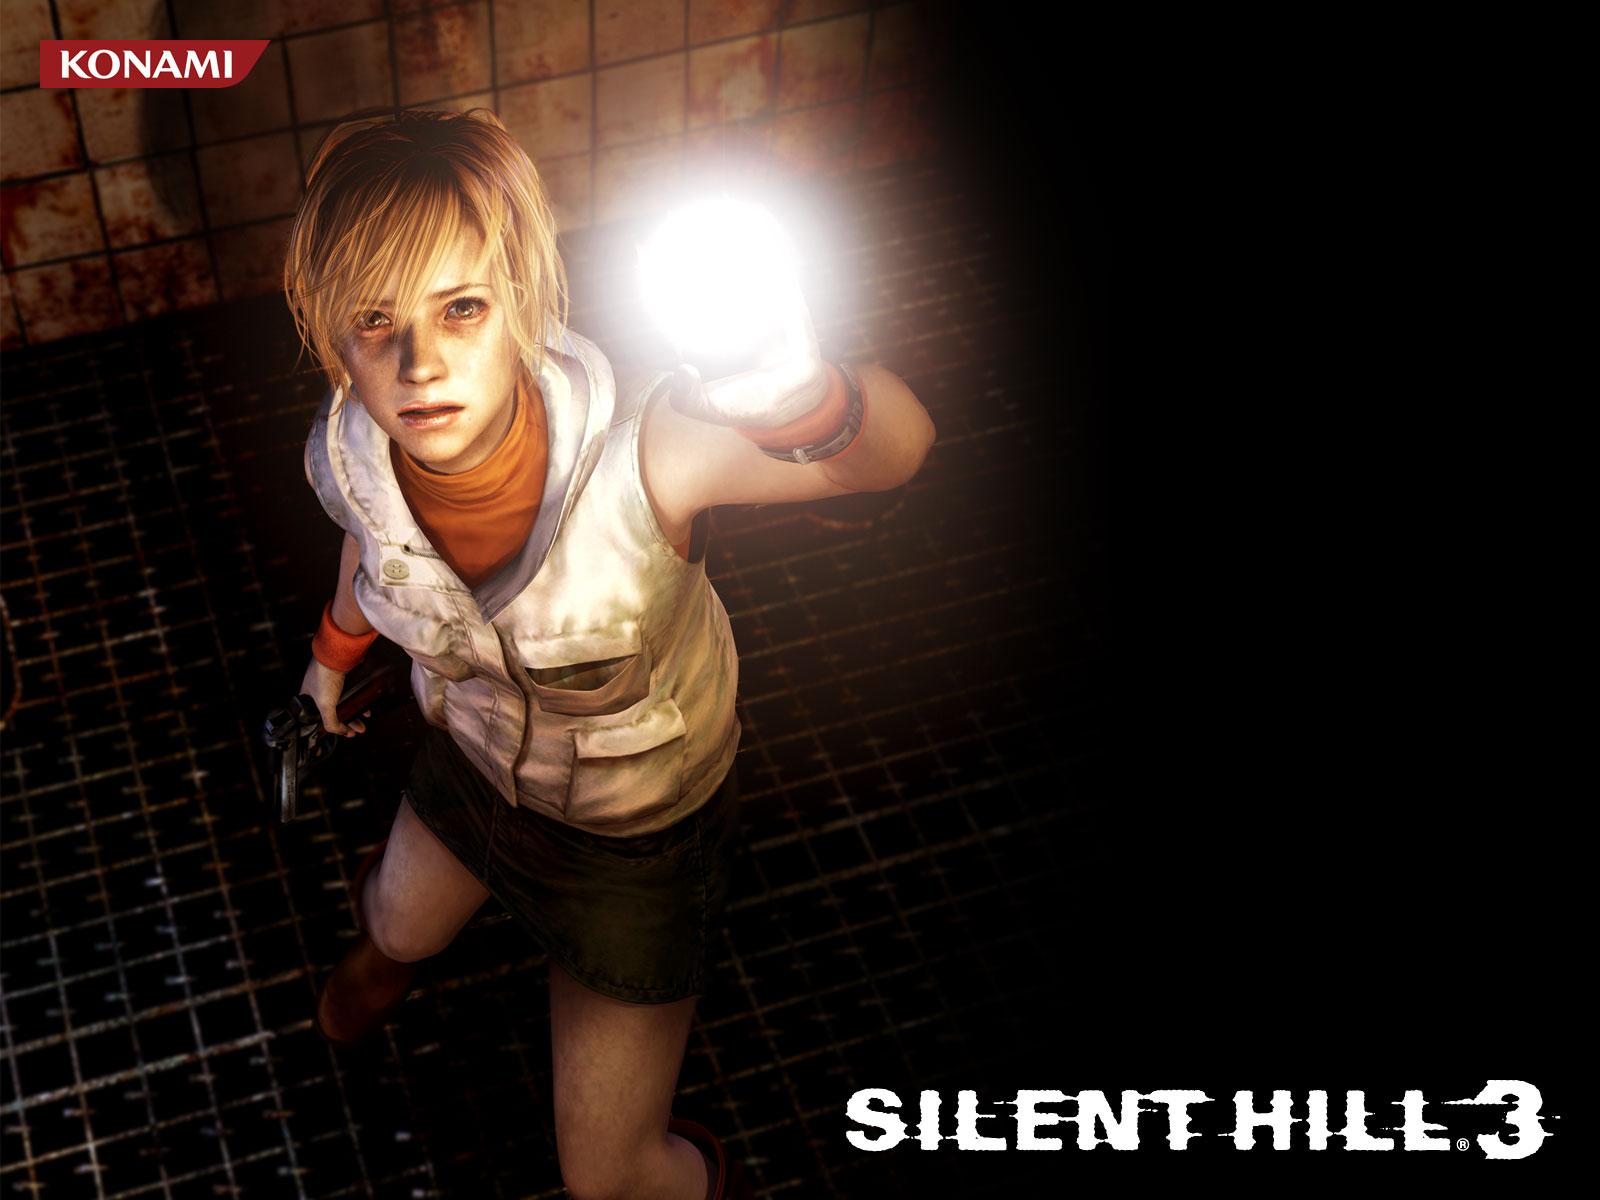 silent-hill-3-wallpaper-heather-flashlight.jpg